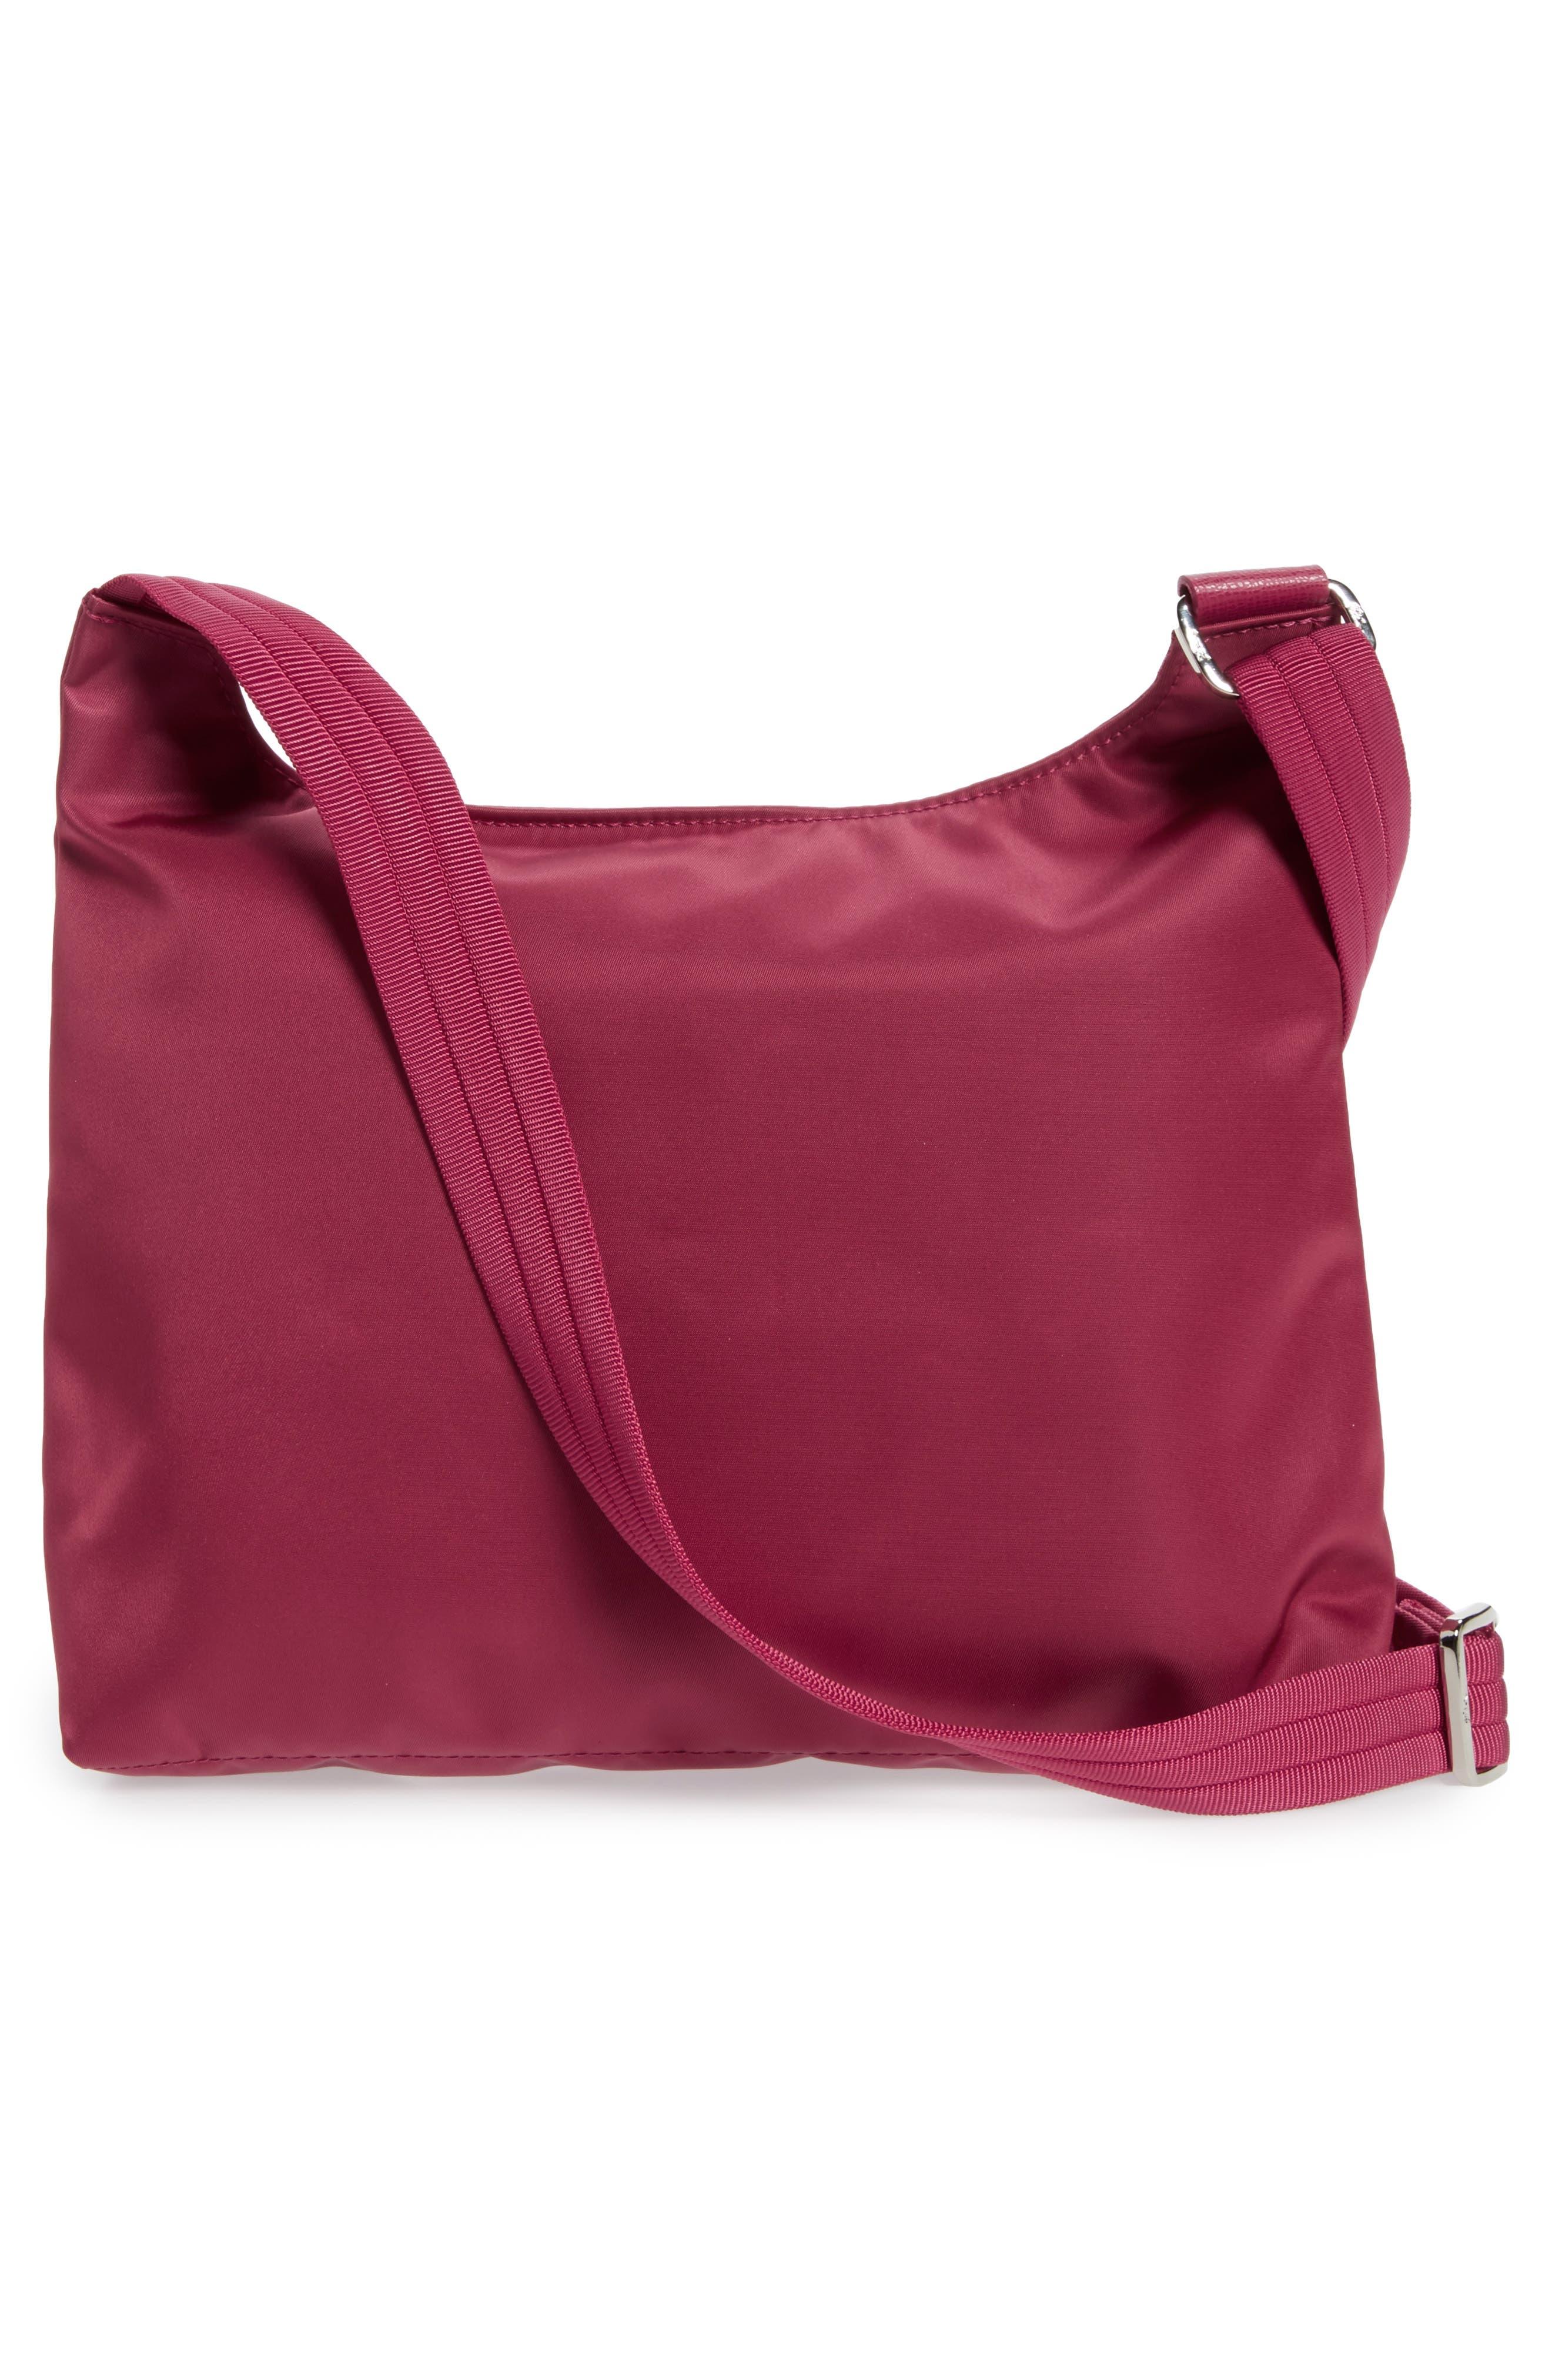 Le Pliage Neo Nylon Crossbody Bag,                             Alternate thumbnail 3, color,                             650